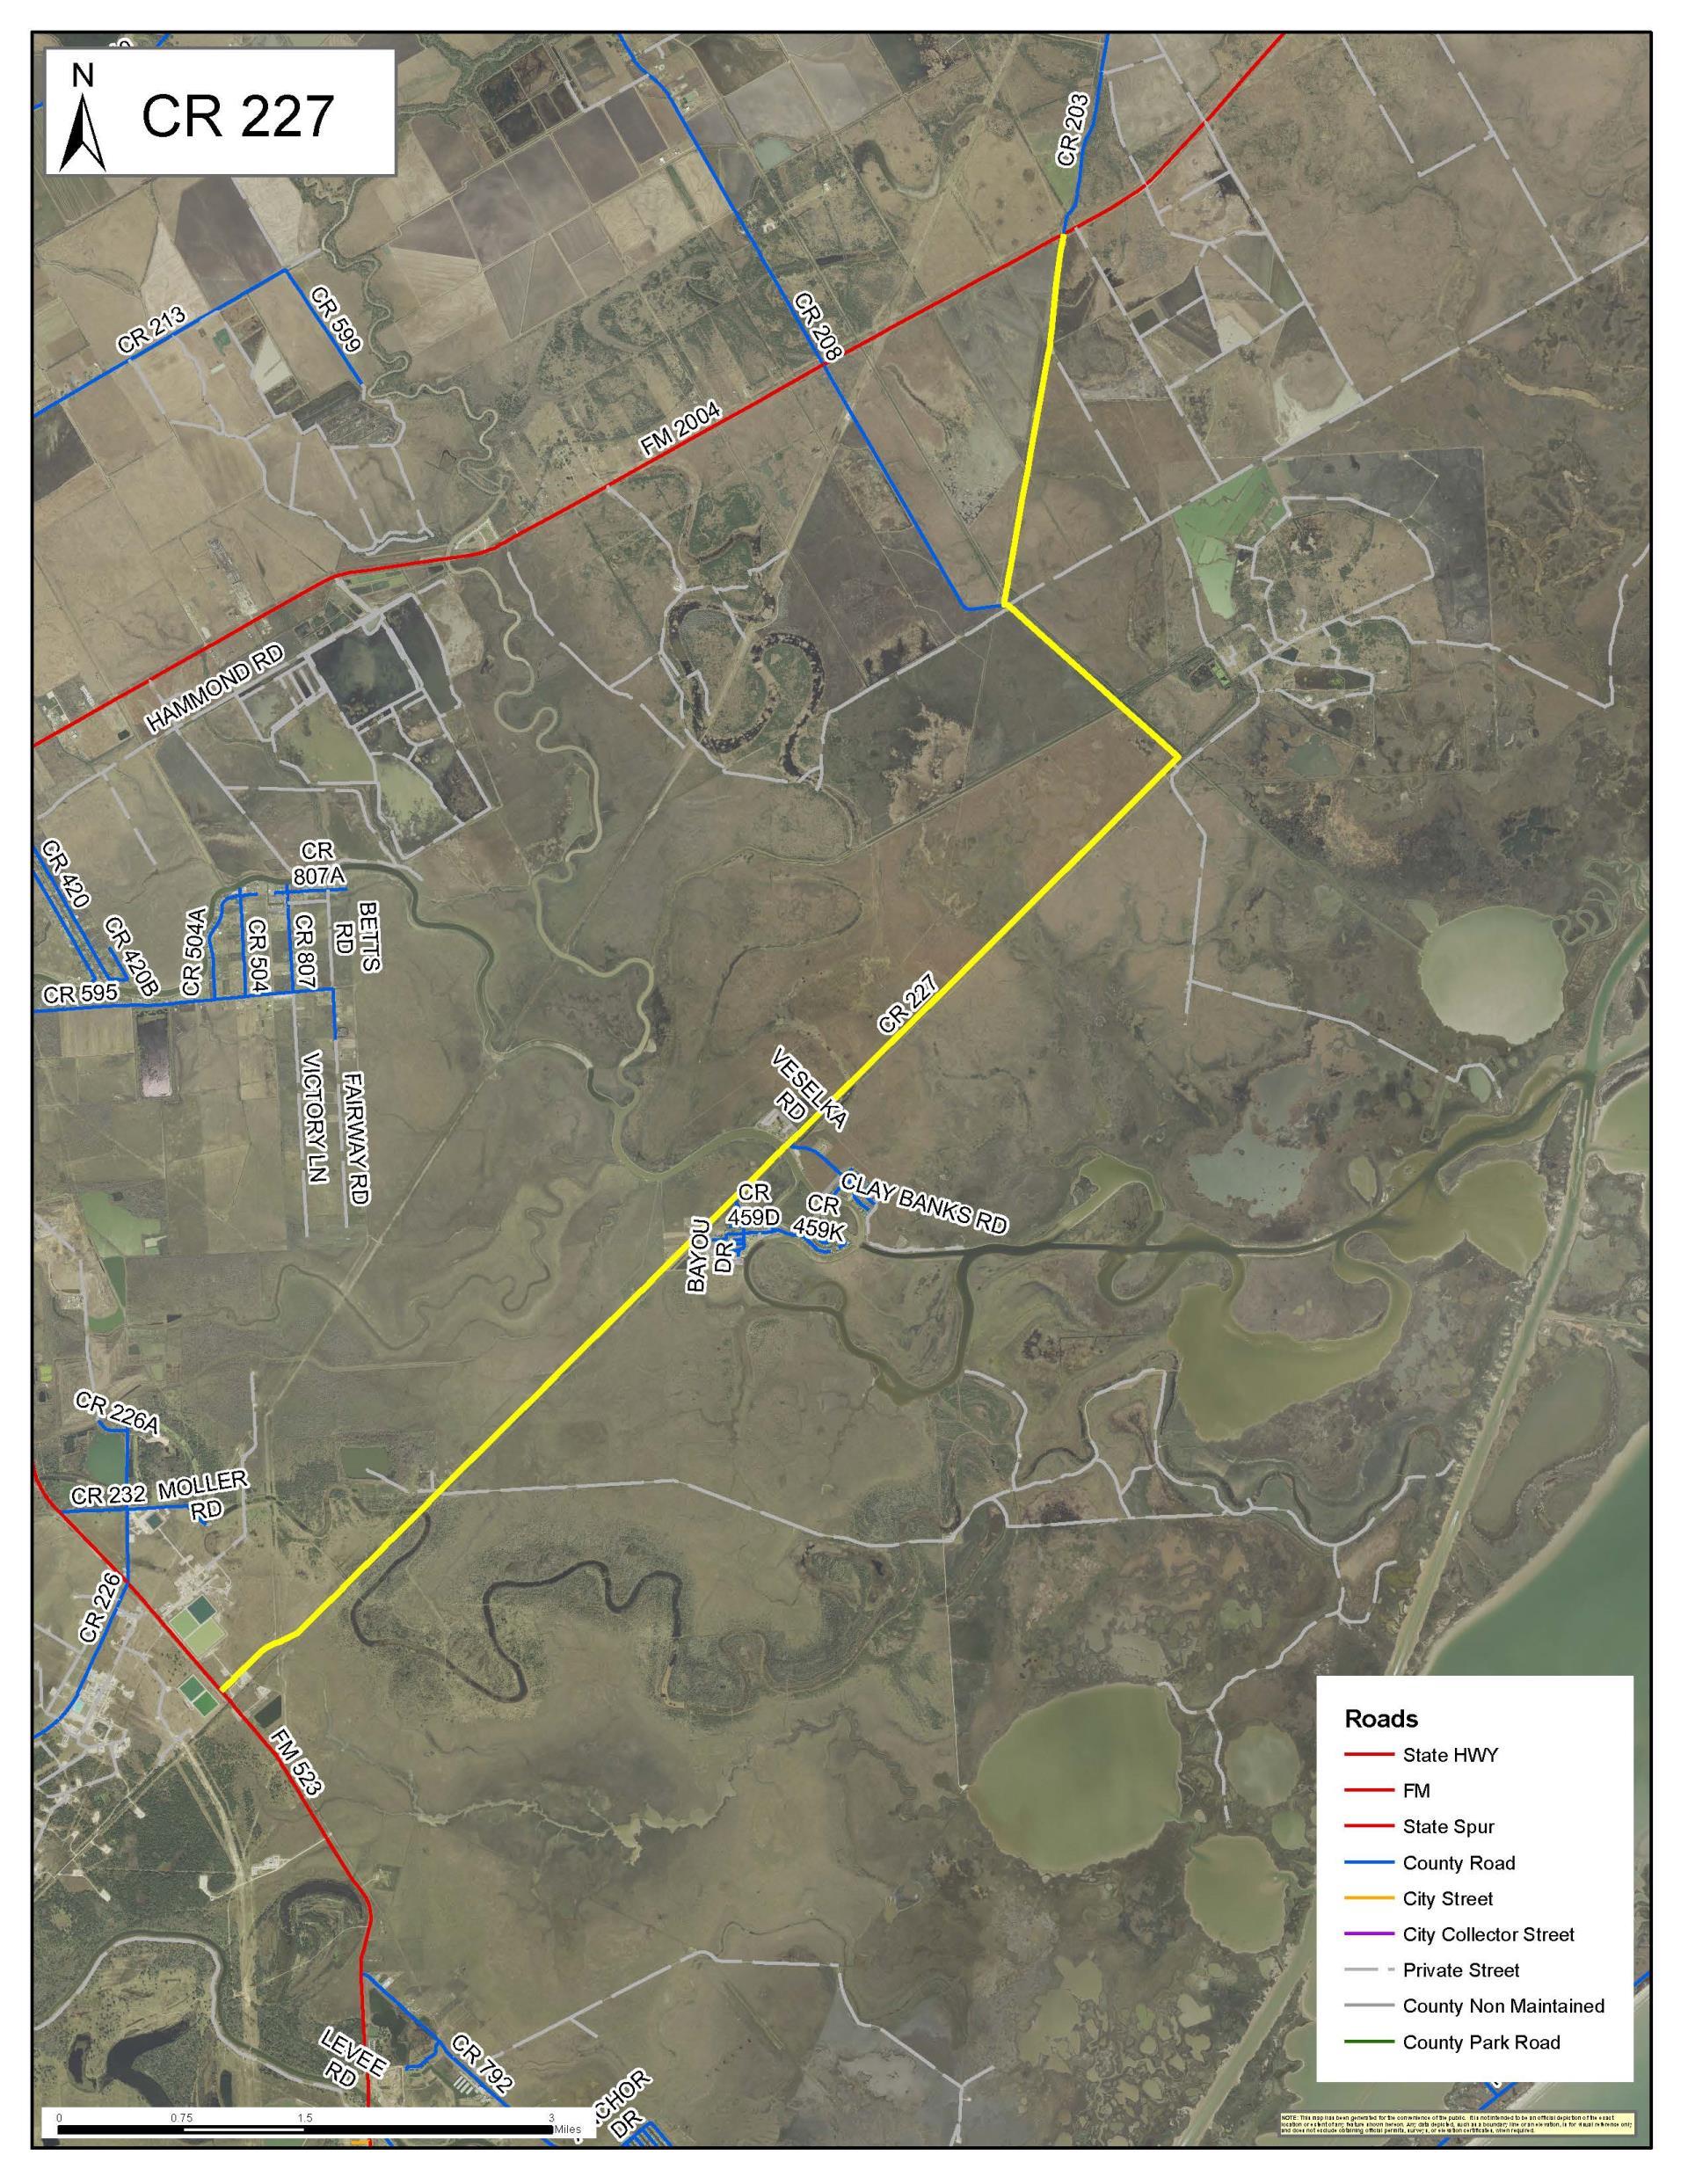 Road & Bridge Closures | zoria County, TX City Of Angleton Texas Map on map whitehouse texas, angleton county texas, mammp angleton texas, map of new york, map of san antonio, texas map katy texas, map of zip code 77566,